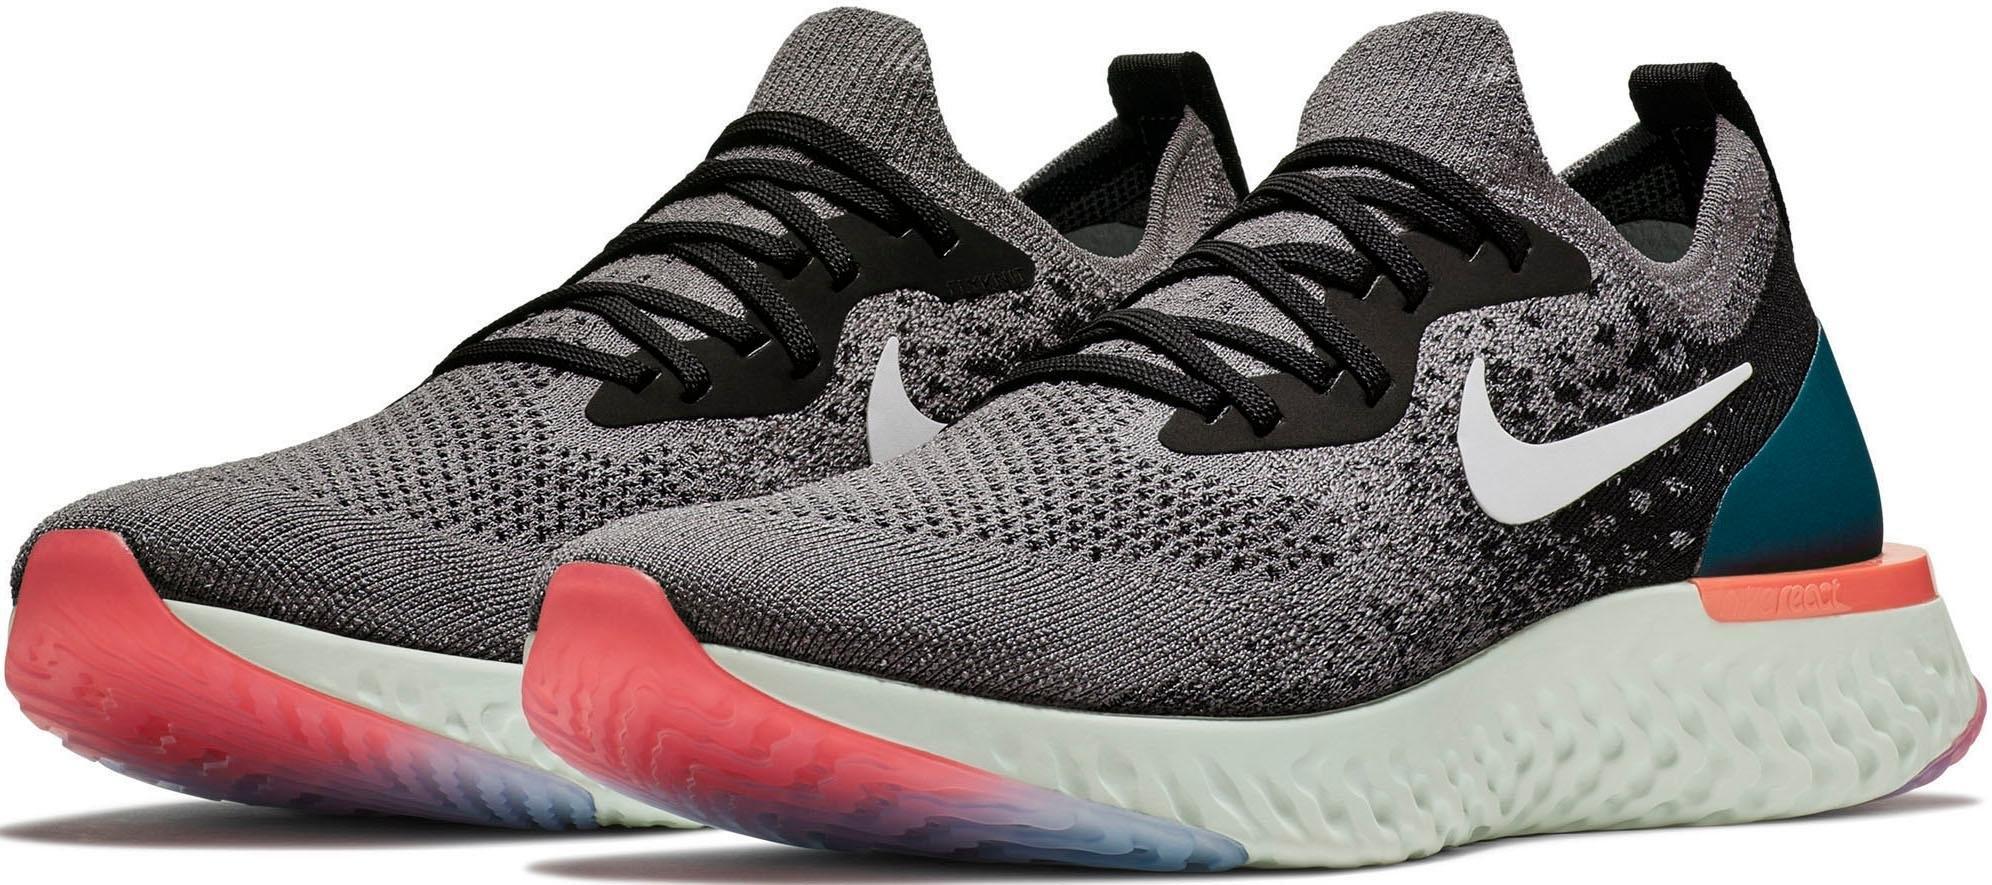 uk availability 2f646 90a58 Afbeeldingsbron Nike runningschoenen »Epic React Flyknit«